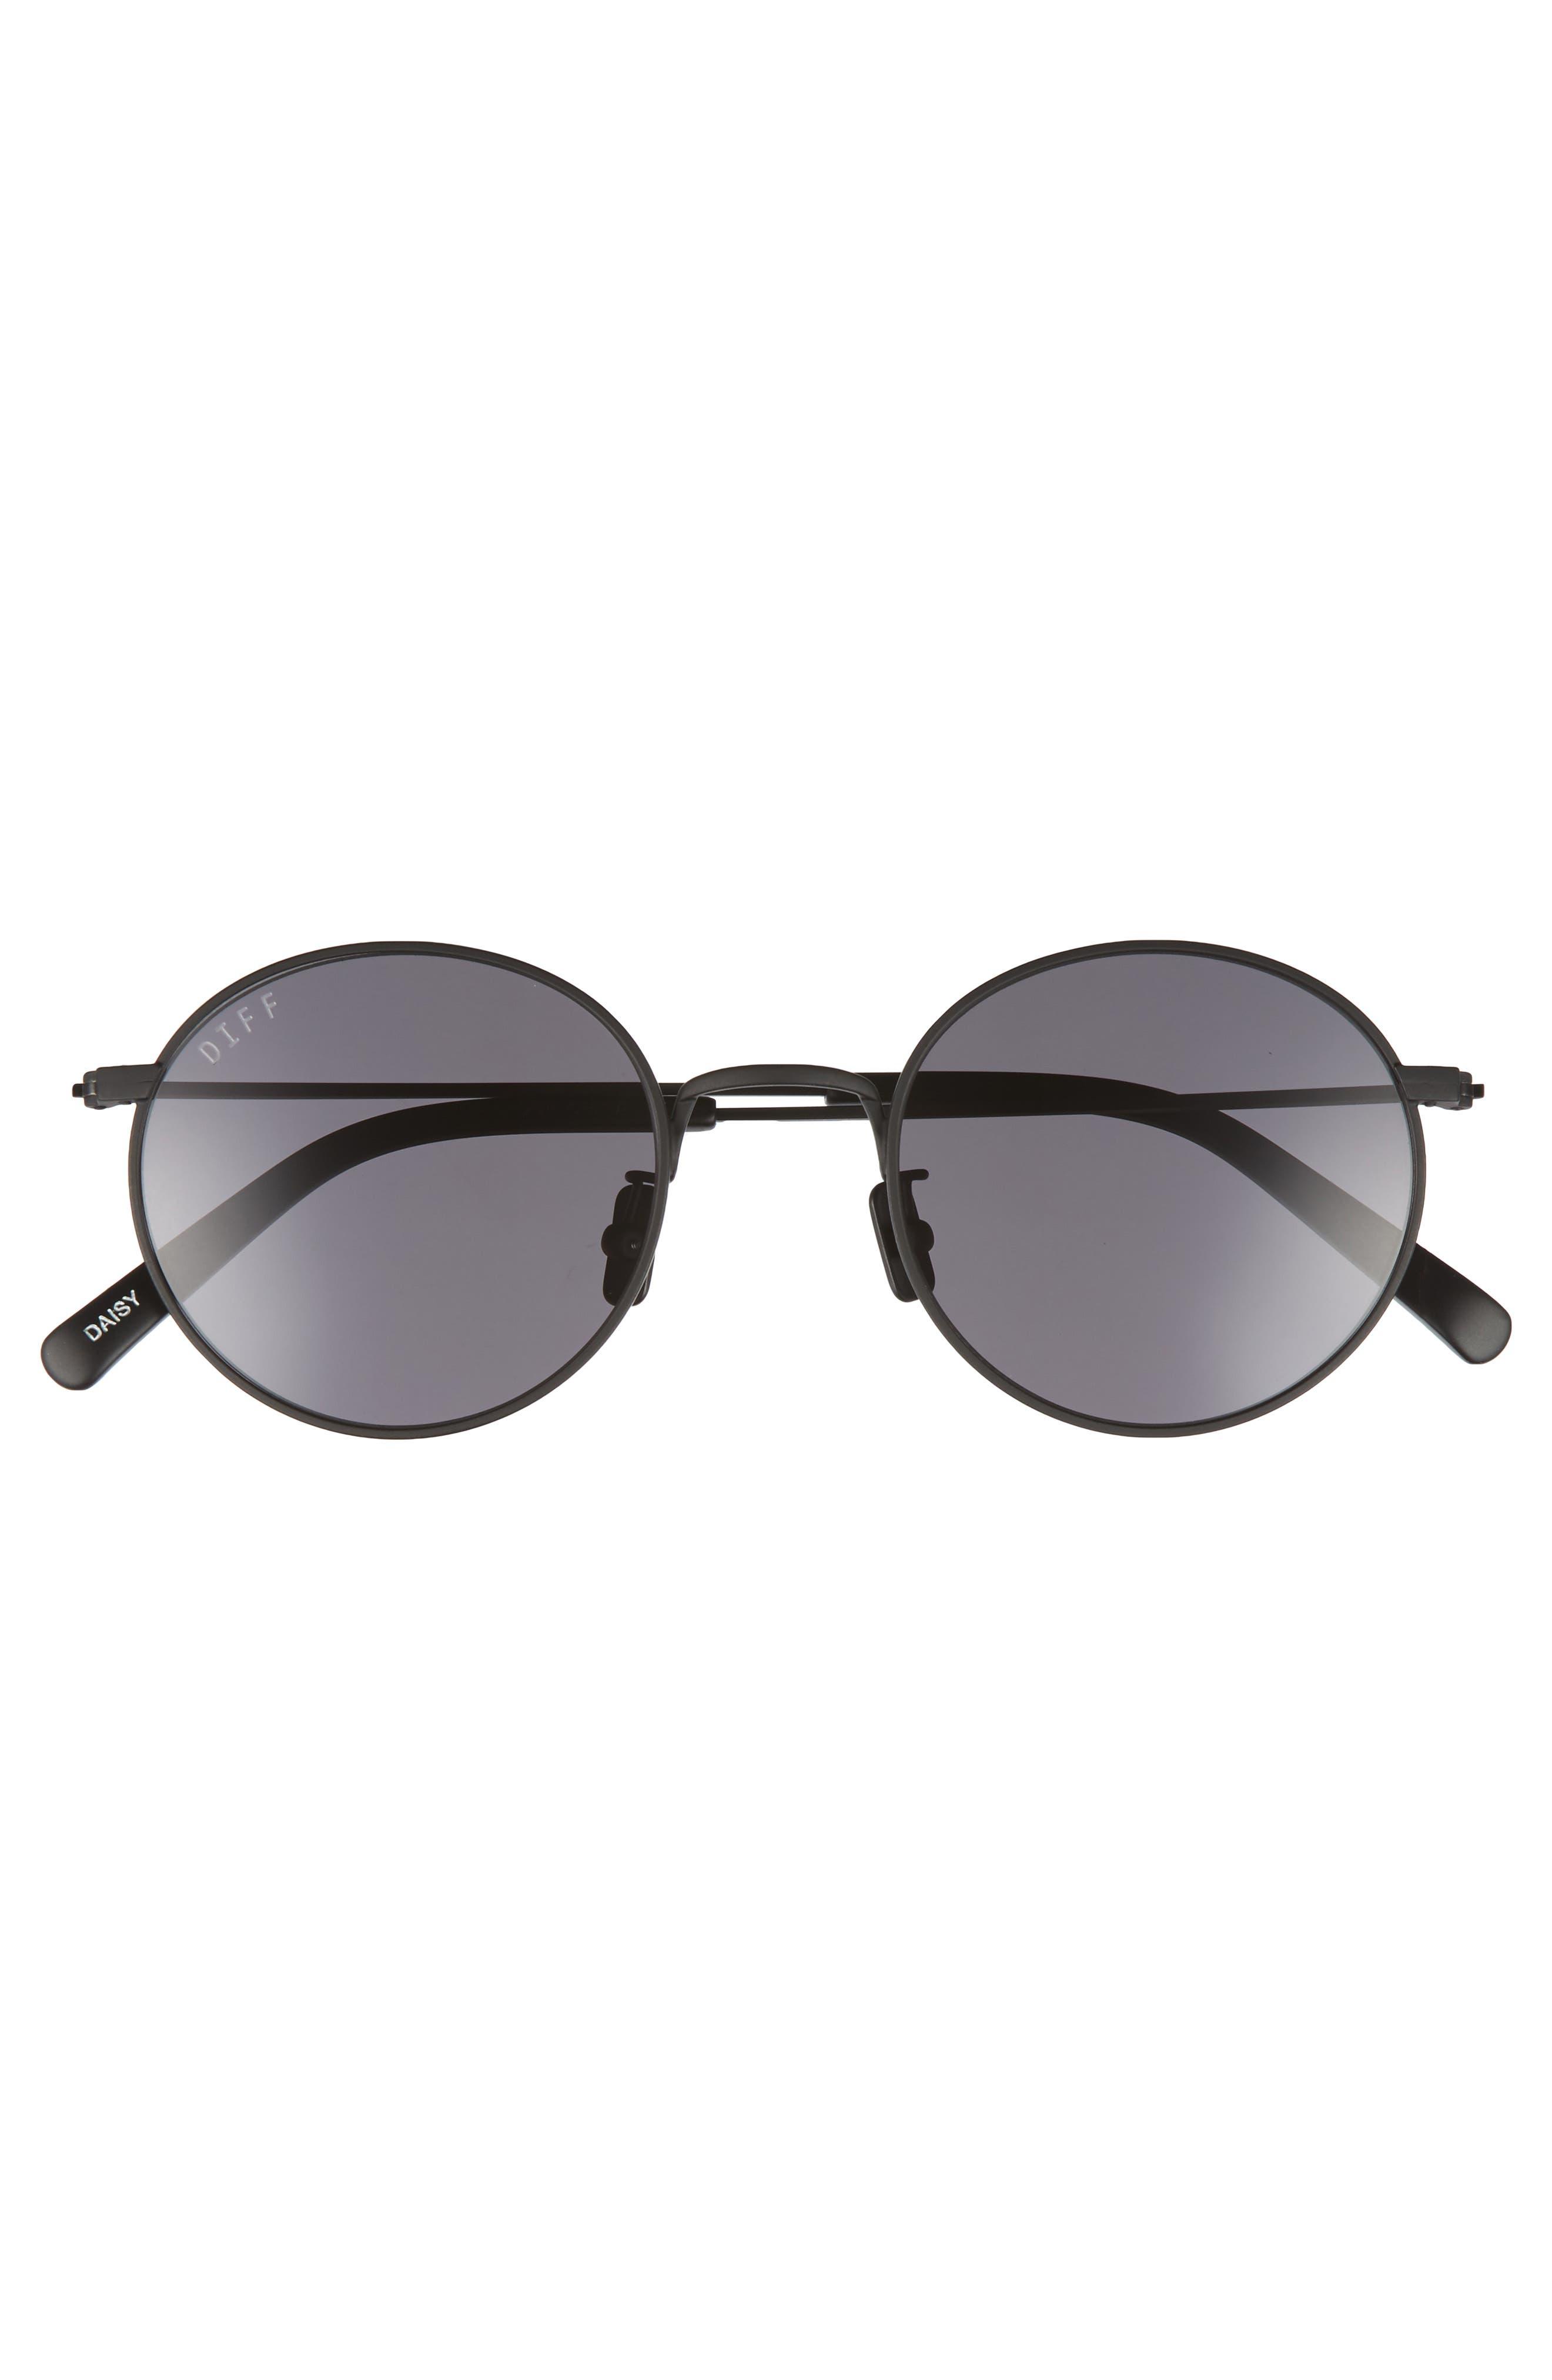 Daisy 51mm Round Sunglasses,                             Alternate thumbnail 3, color,                             Matte Black/ Grey